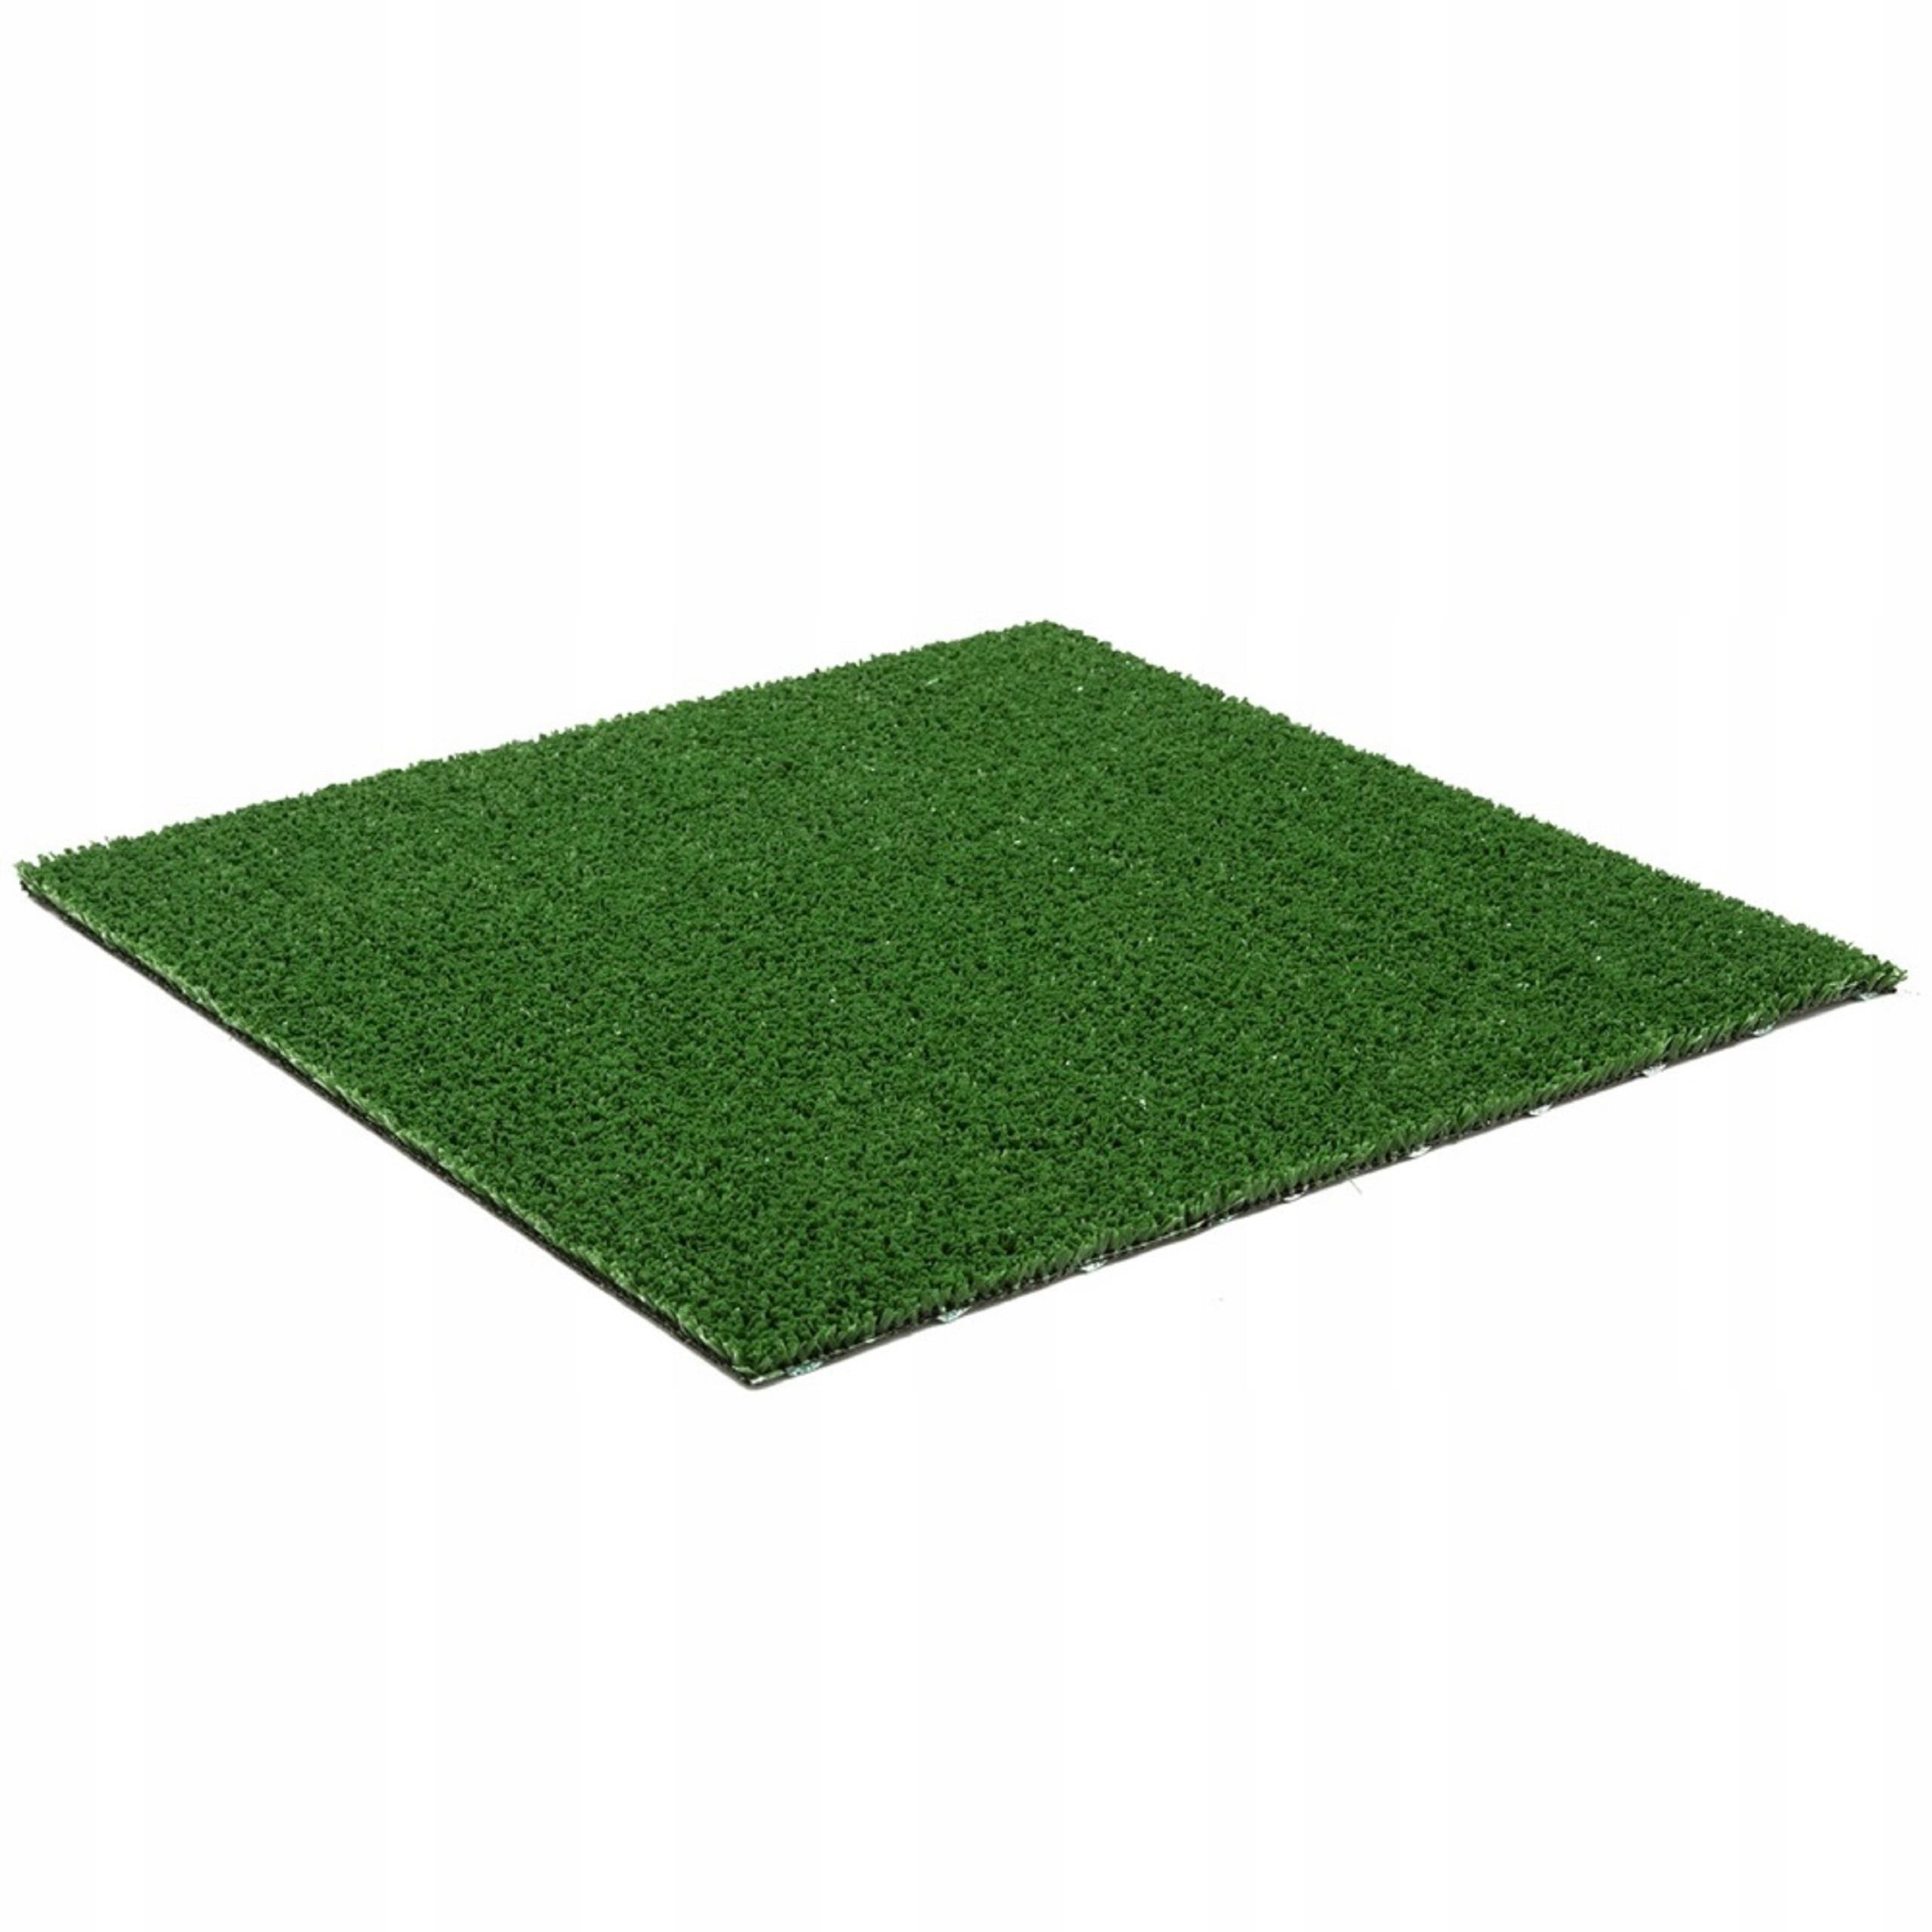 Искусственная трава WIMBLEDON 4.2M COURT COVER